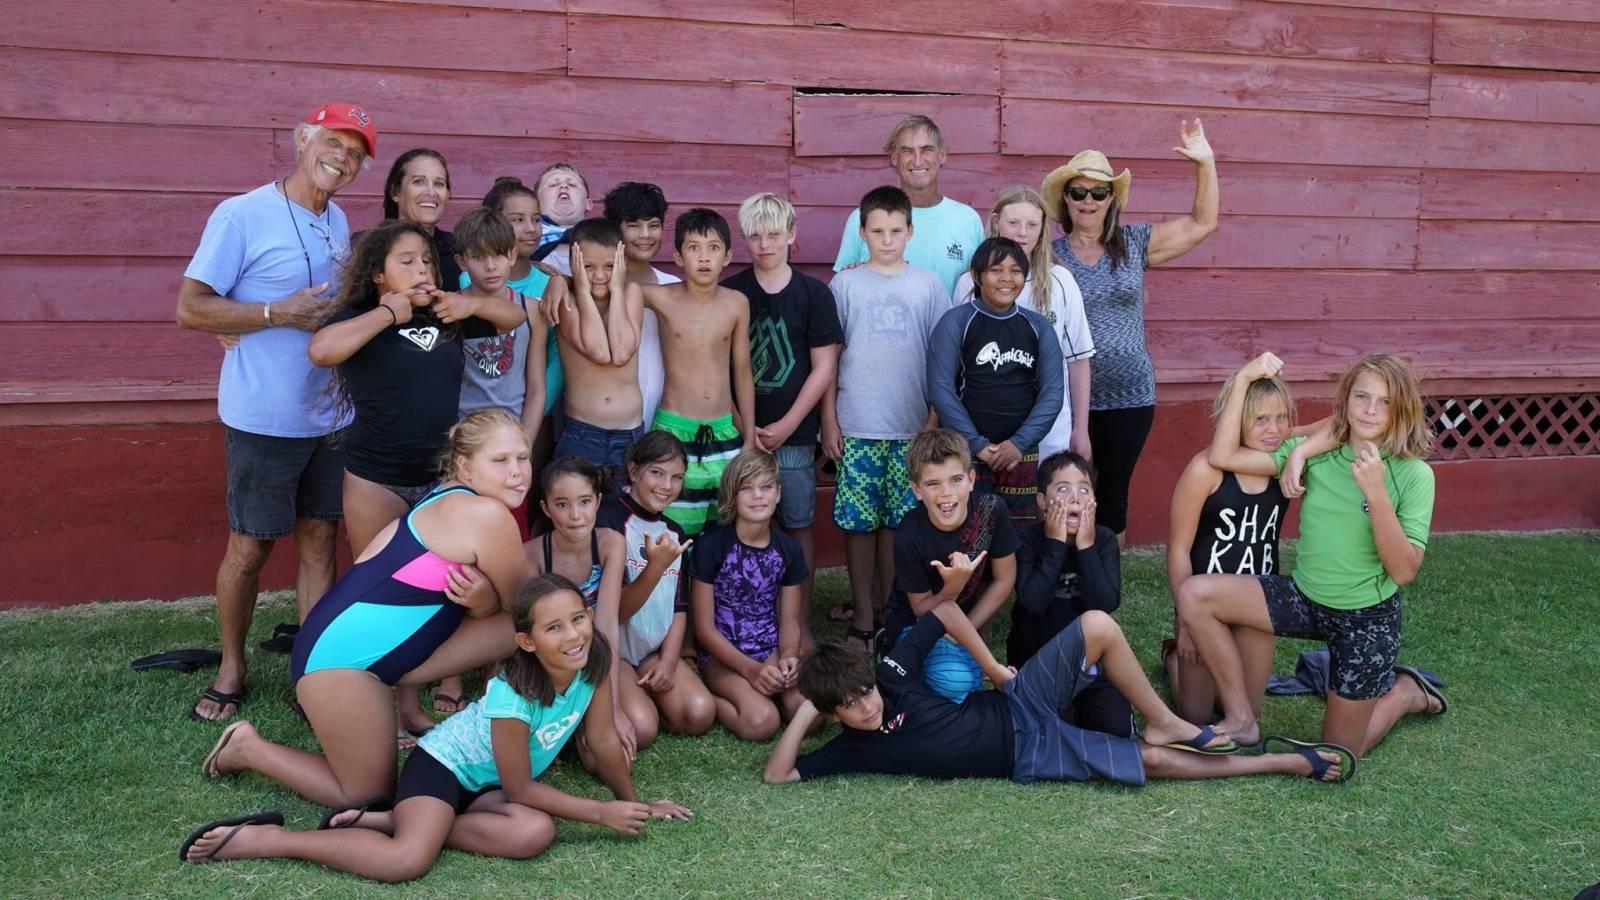 hawaii life charitable fund donates to 4 charities